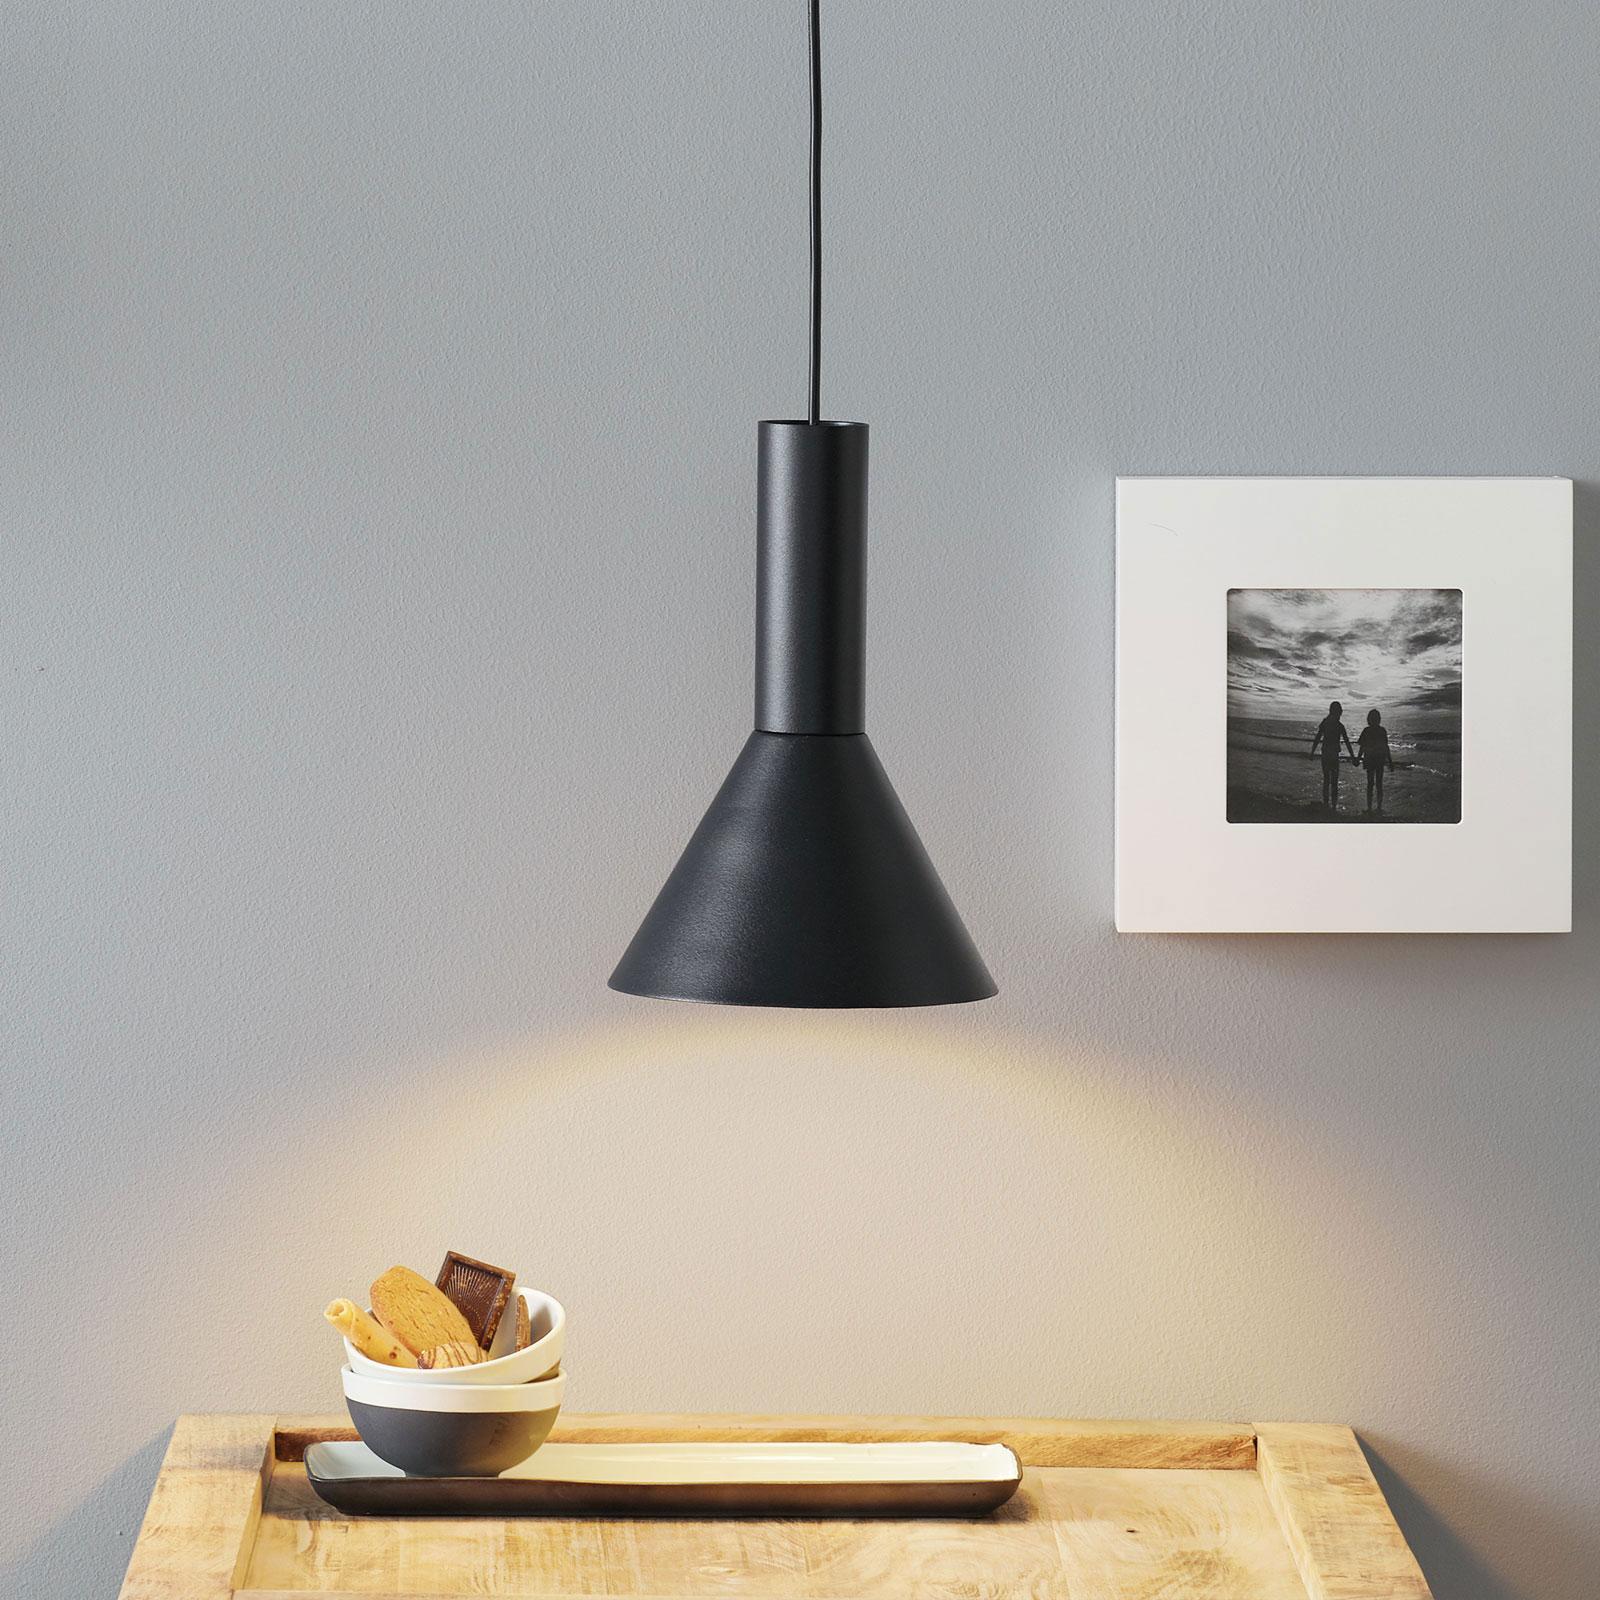 Lucande Caris pendellampe Ø 19 cm sort/hvid